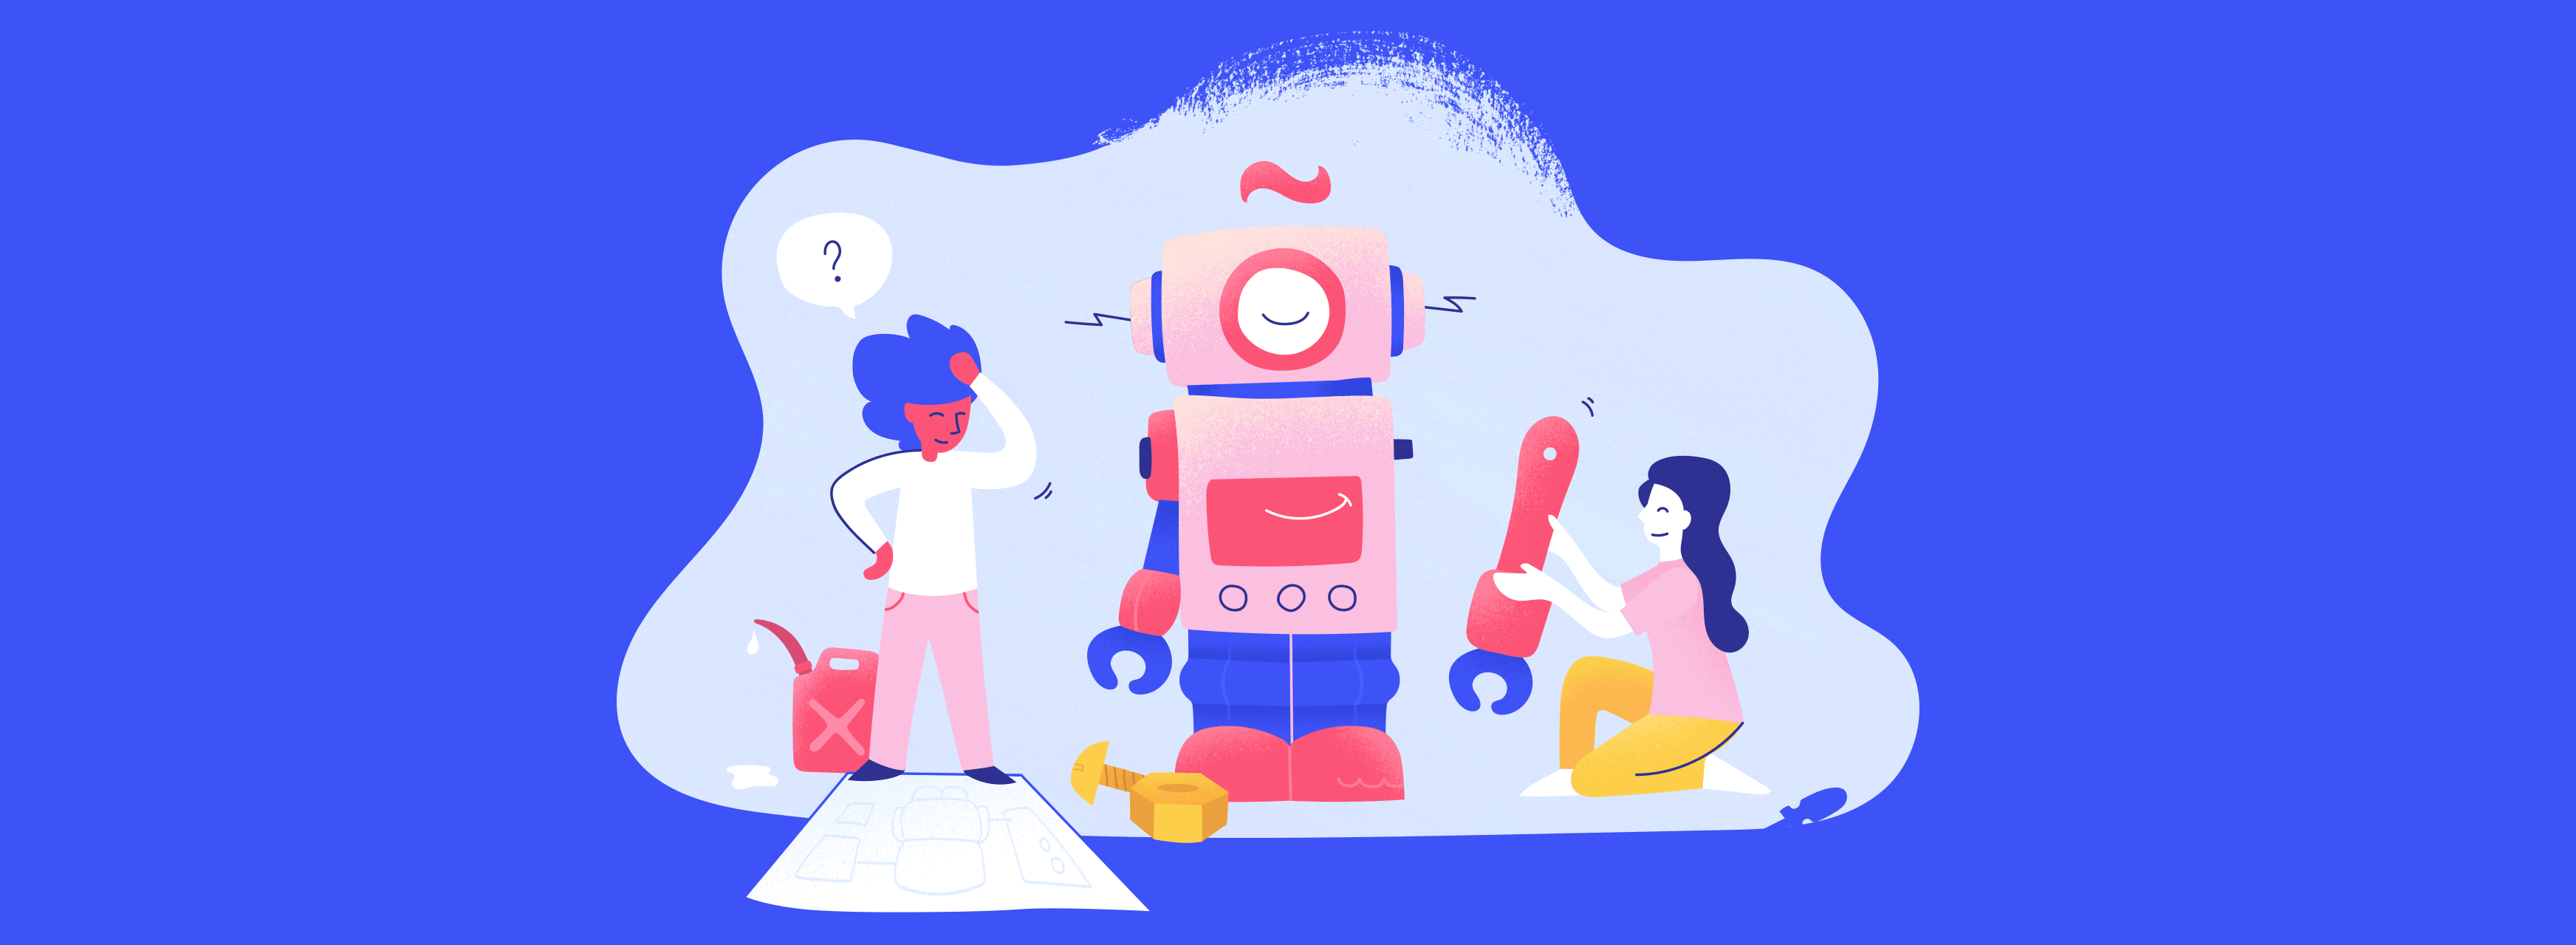 Team Building a Robot